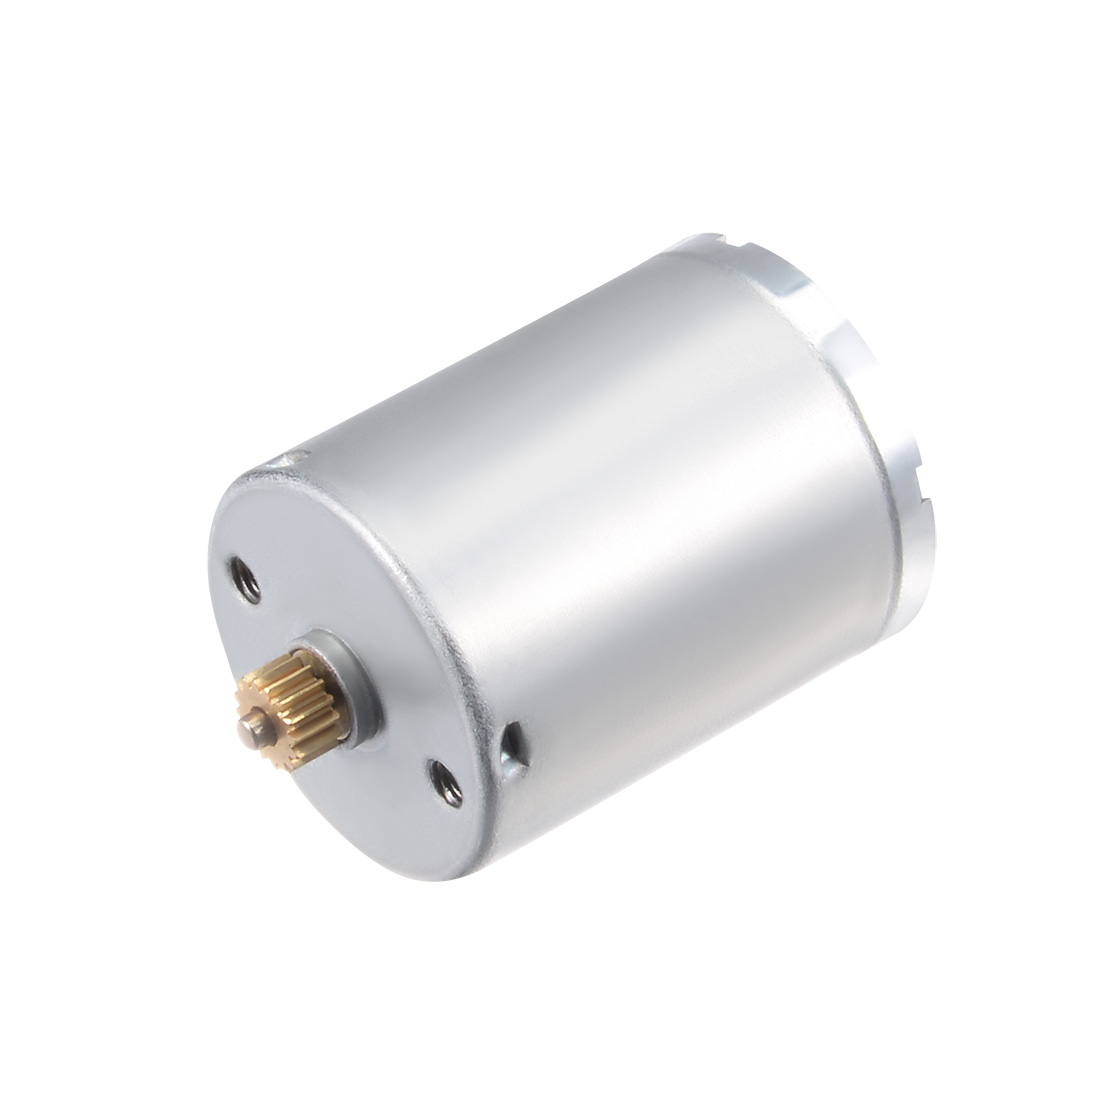 Micro Motor DC 6V 14000RPM 9 Teeth High Speed Motor for DIY Model Remote Control